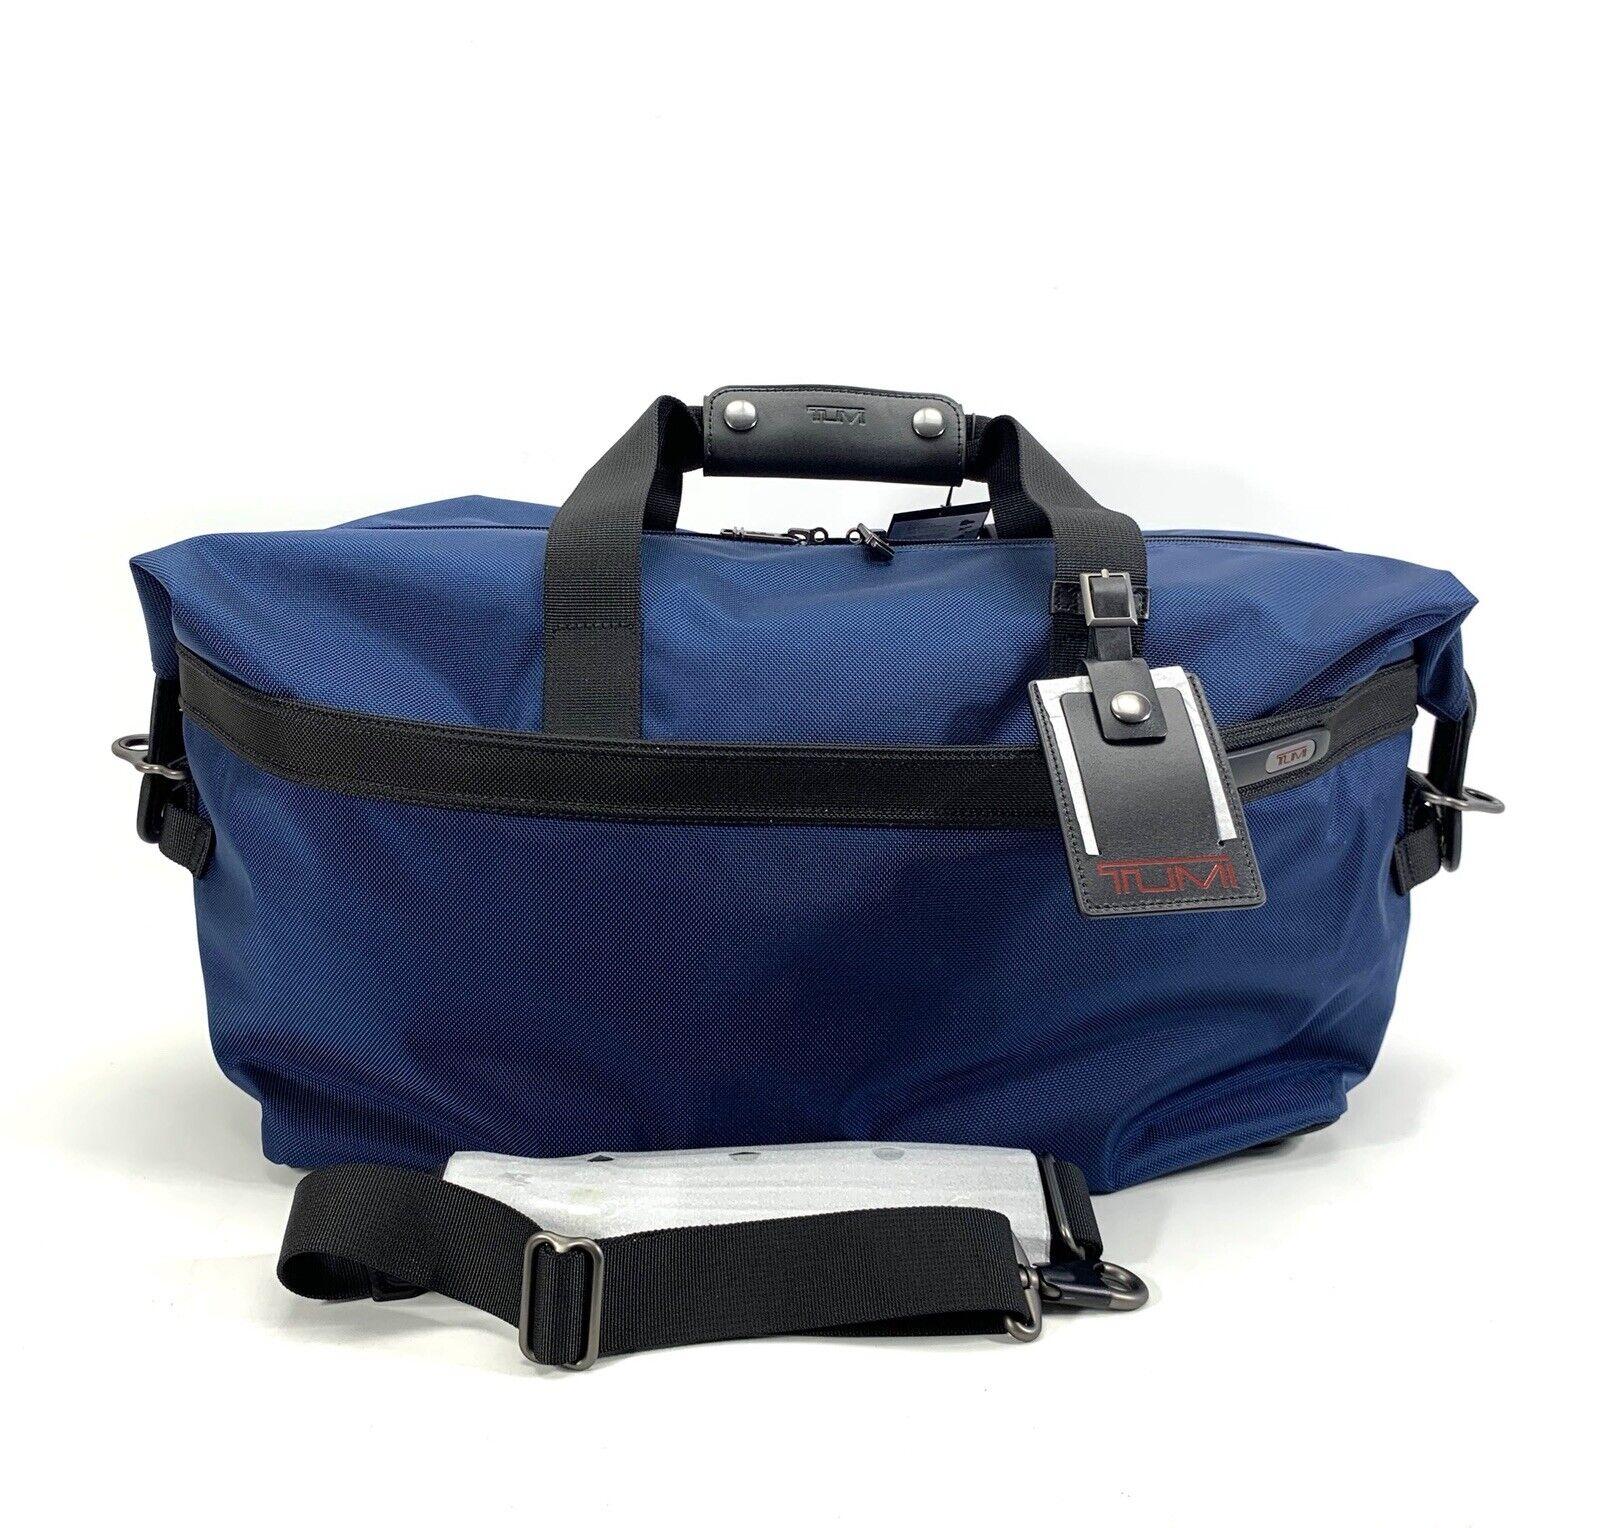 Tumi Duffel Bag Small Soft Travel